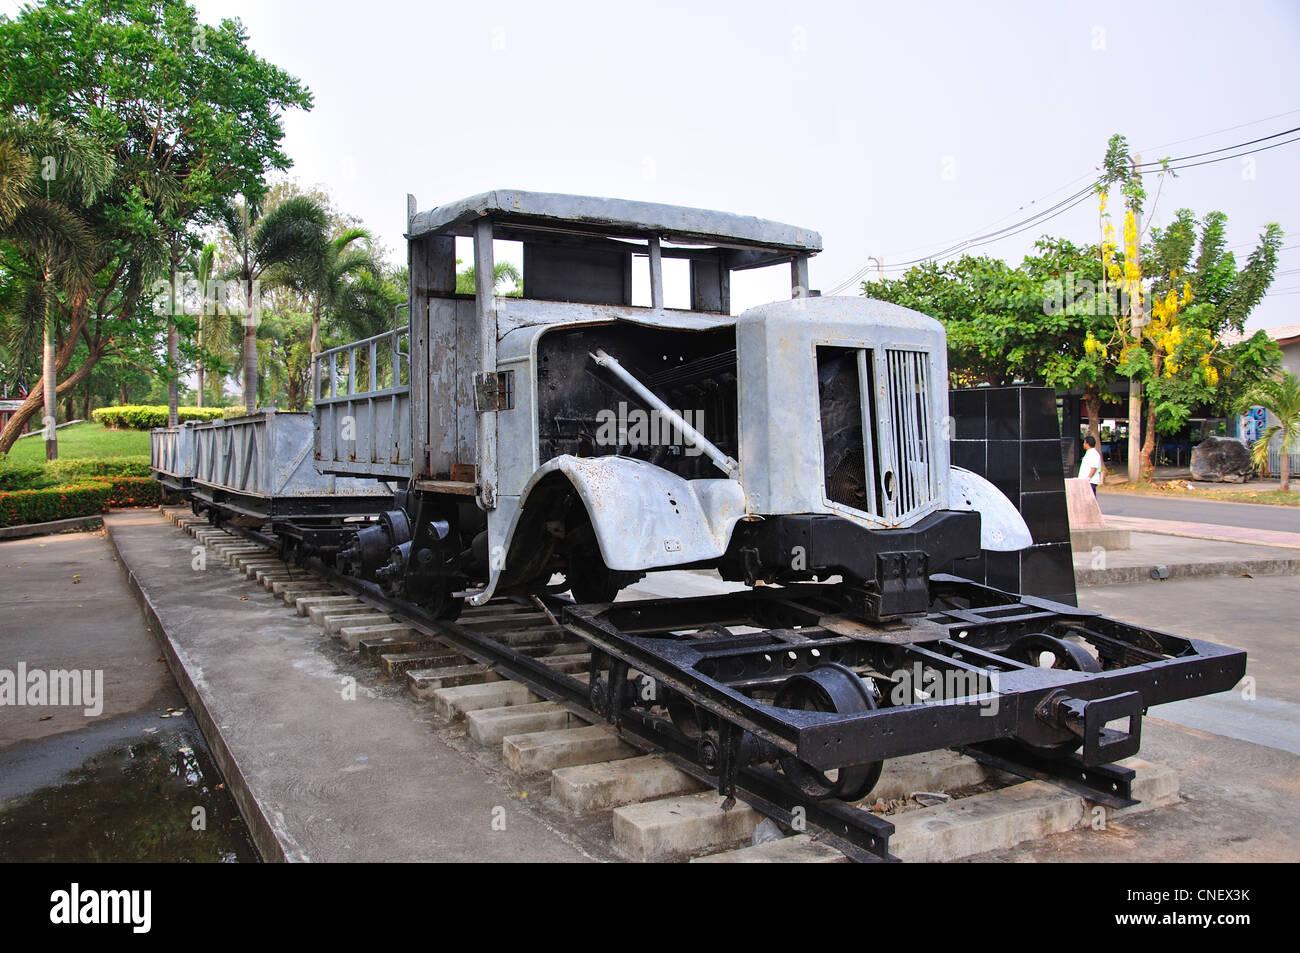 Relic truck mounted on railway carriage at The Bridge over the River Kwai, Kanchanaburi, Kanchanaburi Province, - Stock Image